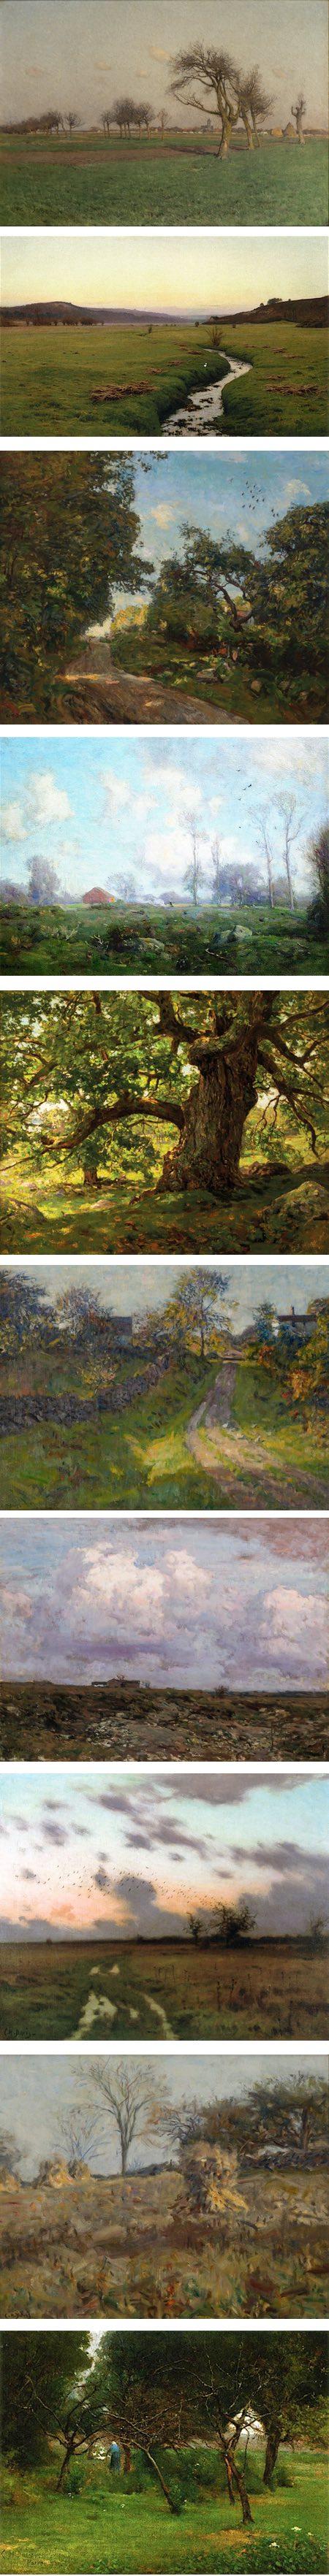 Charles Harold Davis, landscape paintings